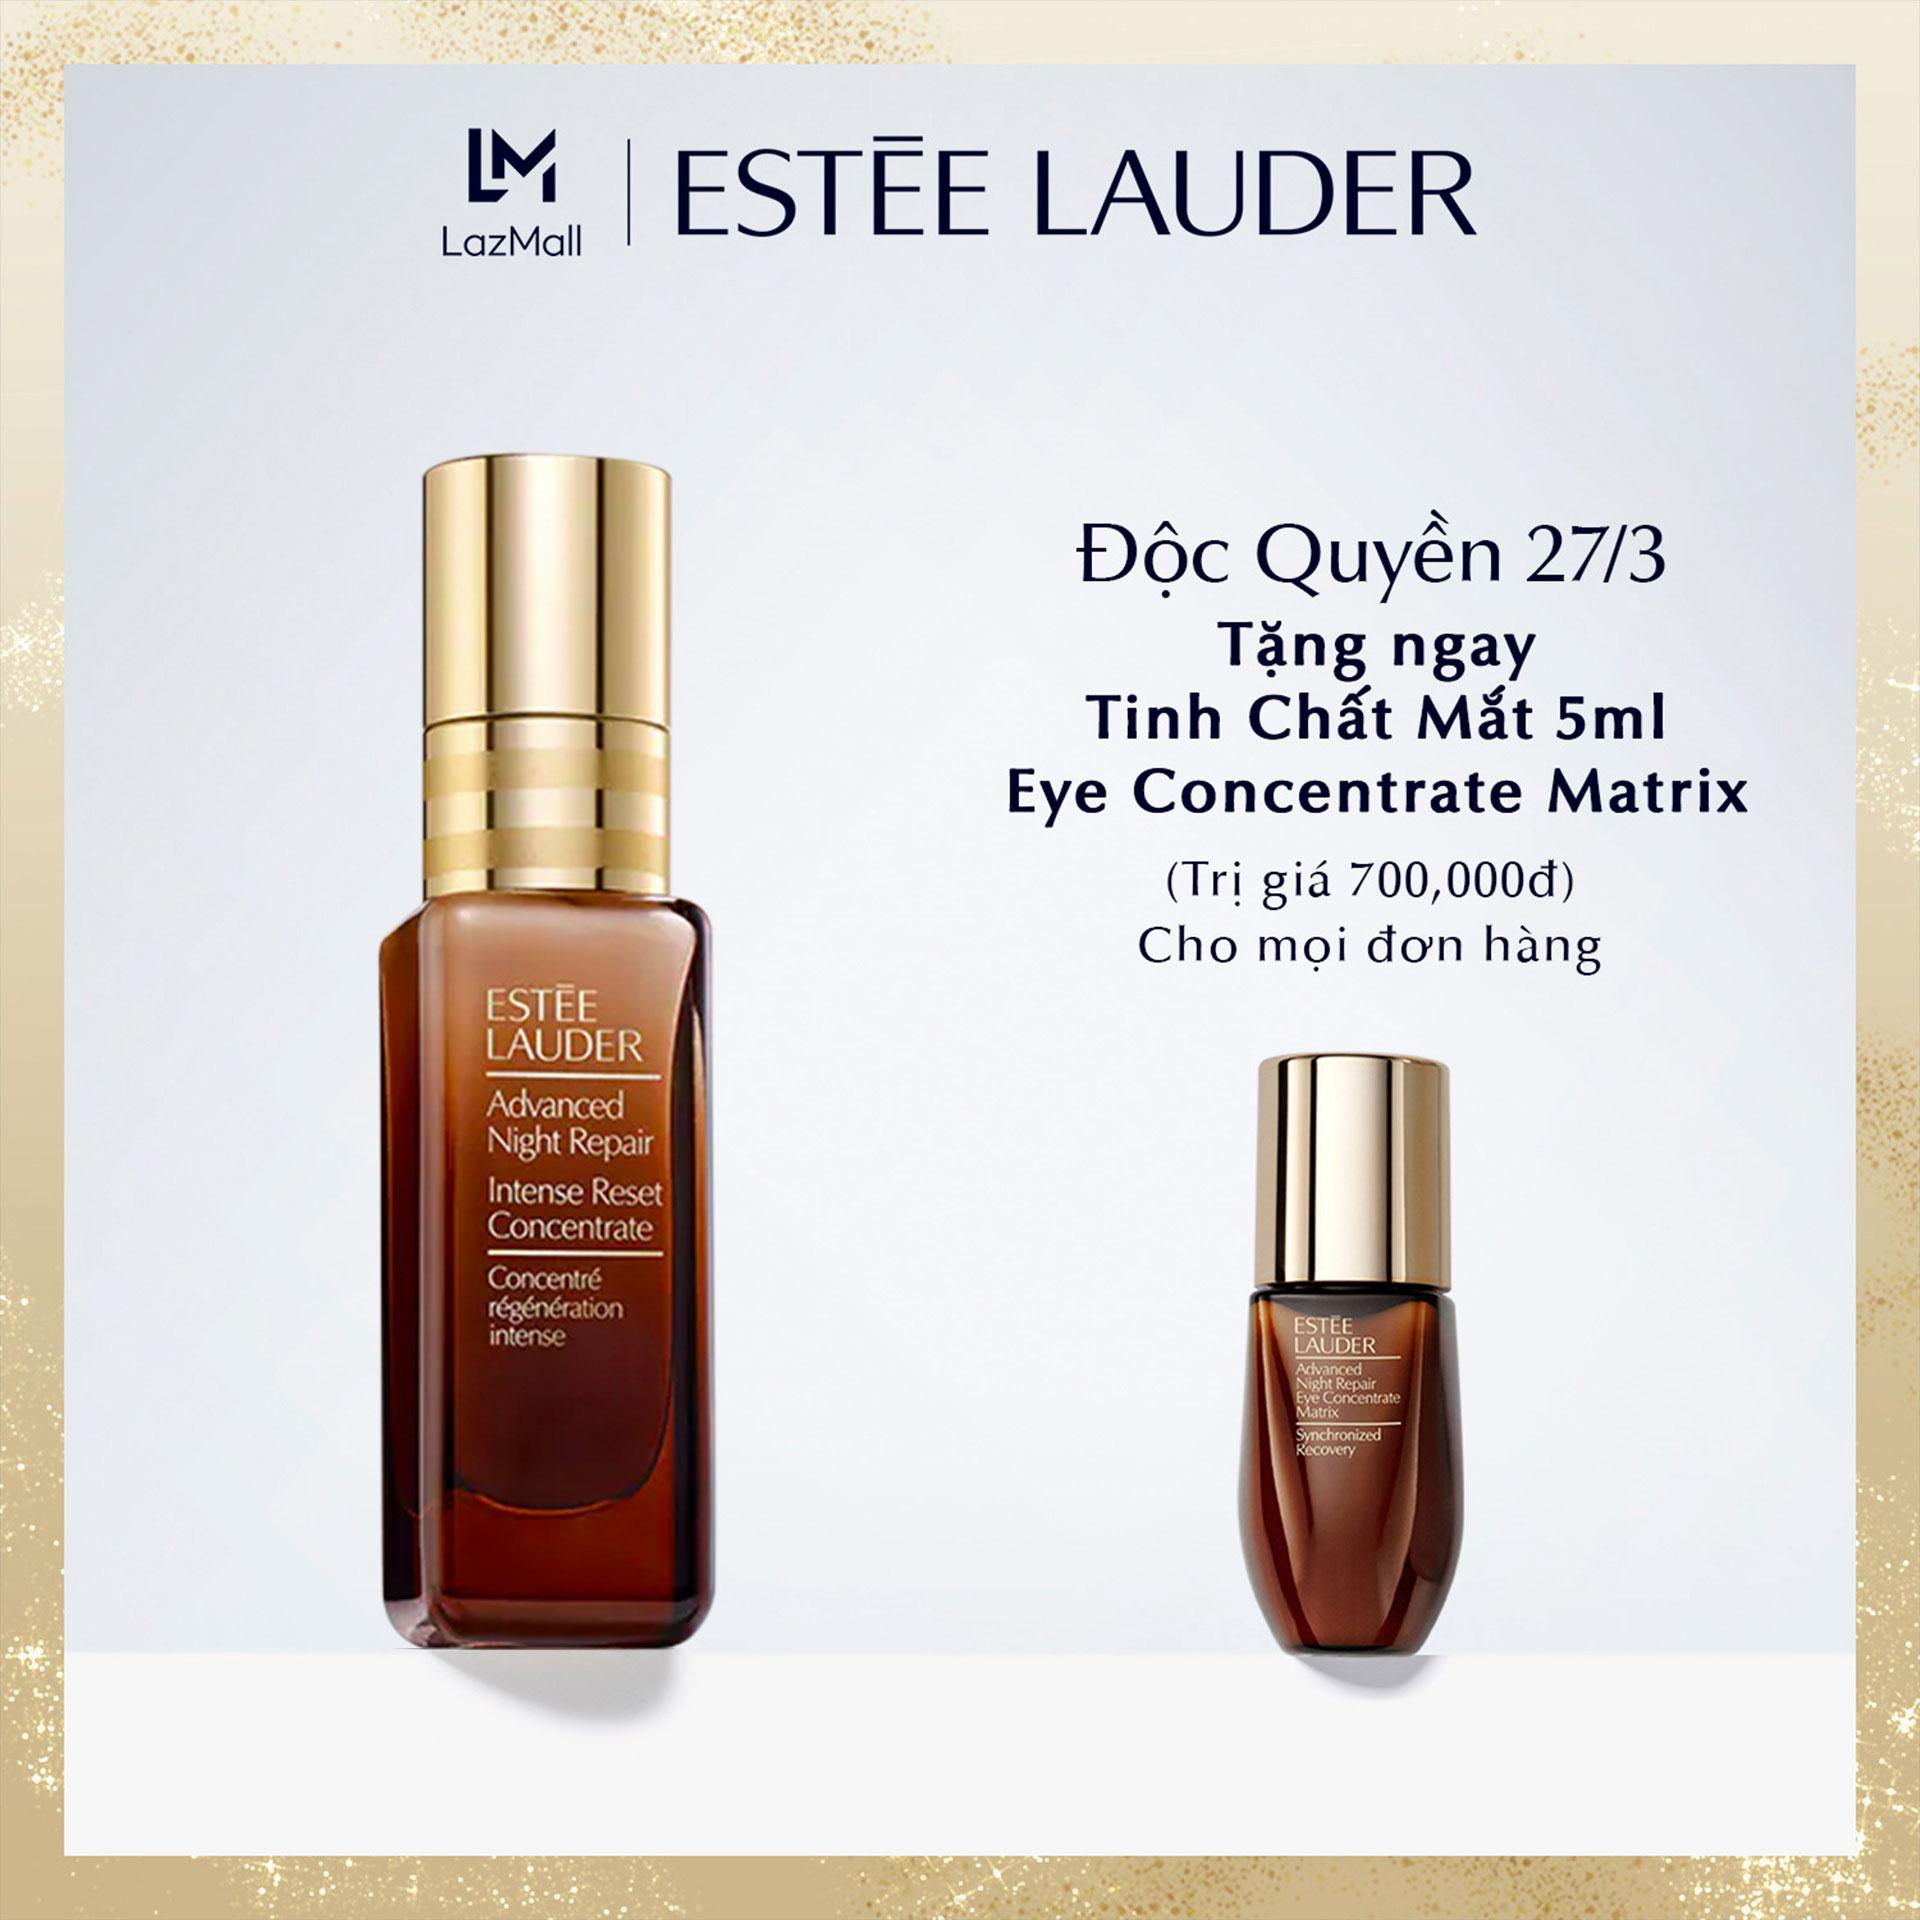 Tinh chất giải cứu làn da tức thì Estee Lauder Advanced Night Repair Intense Reset Concentrate - Serum 20ml nhập khẩu